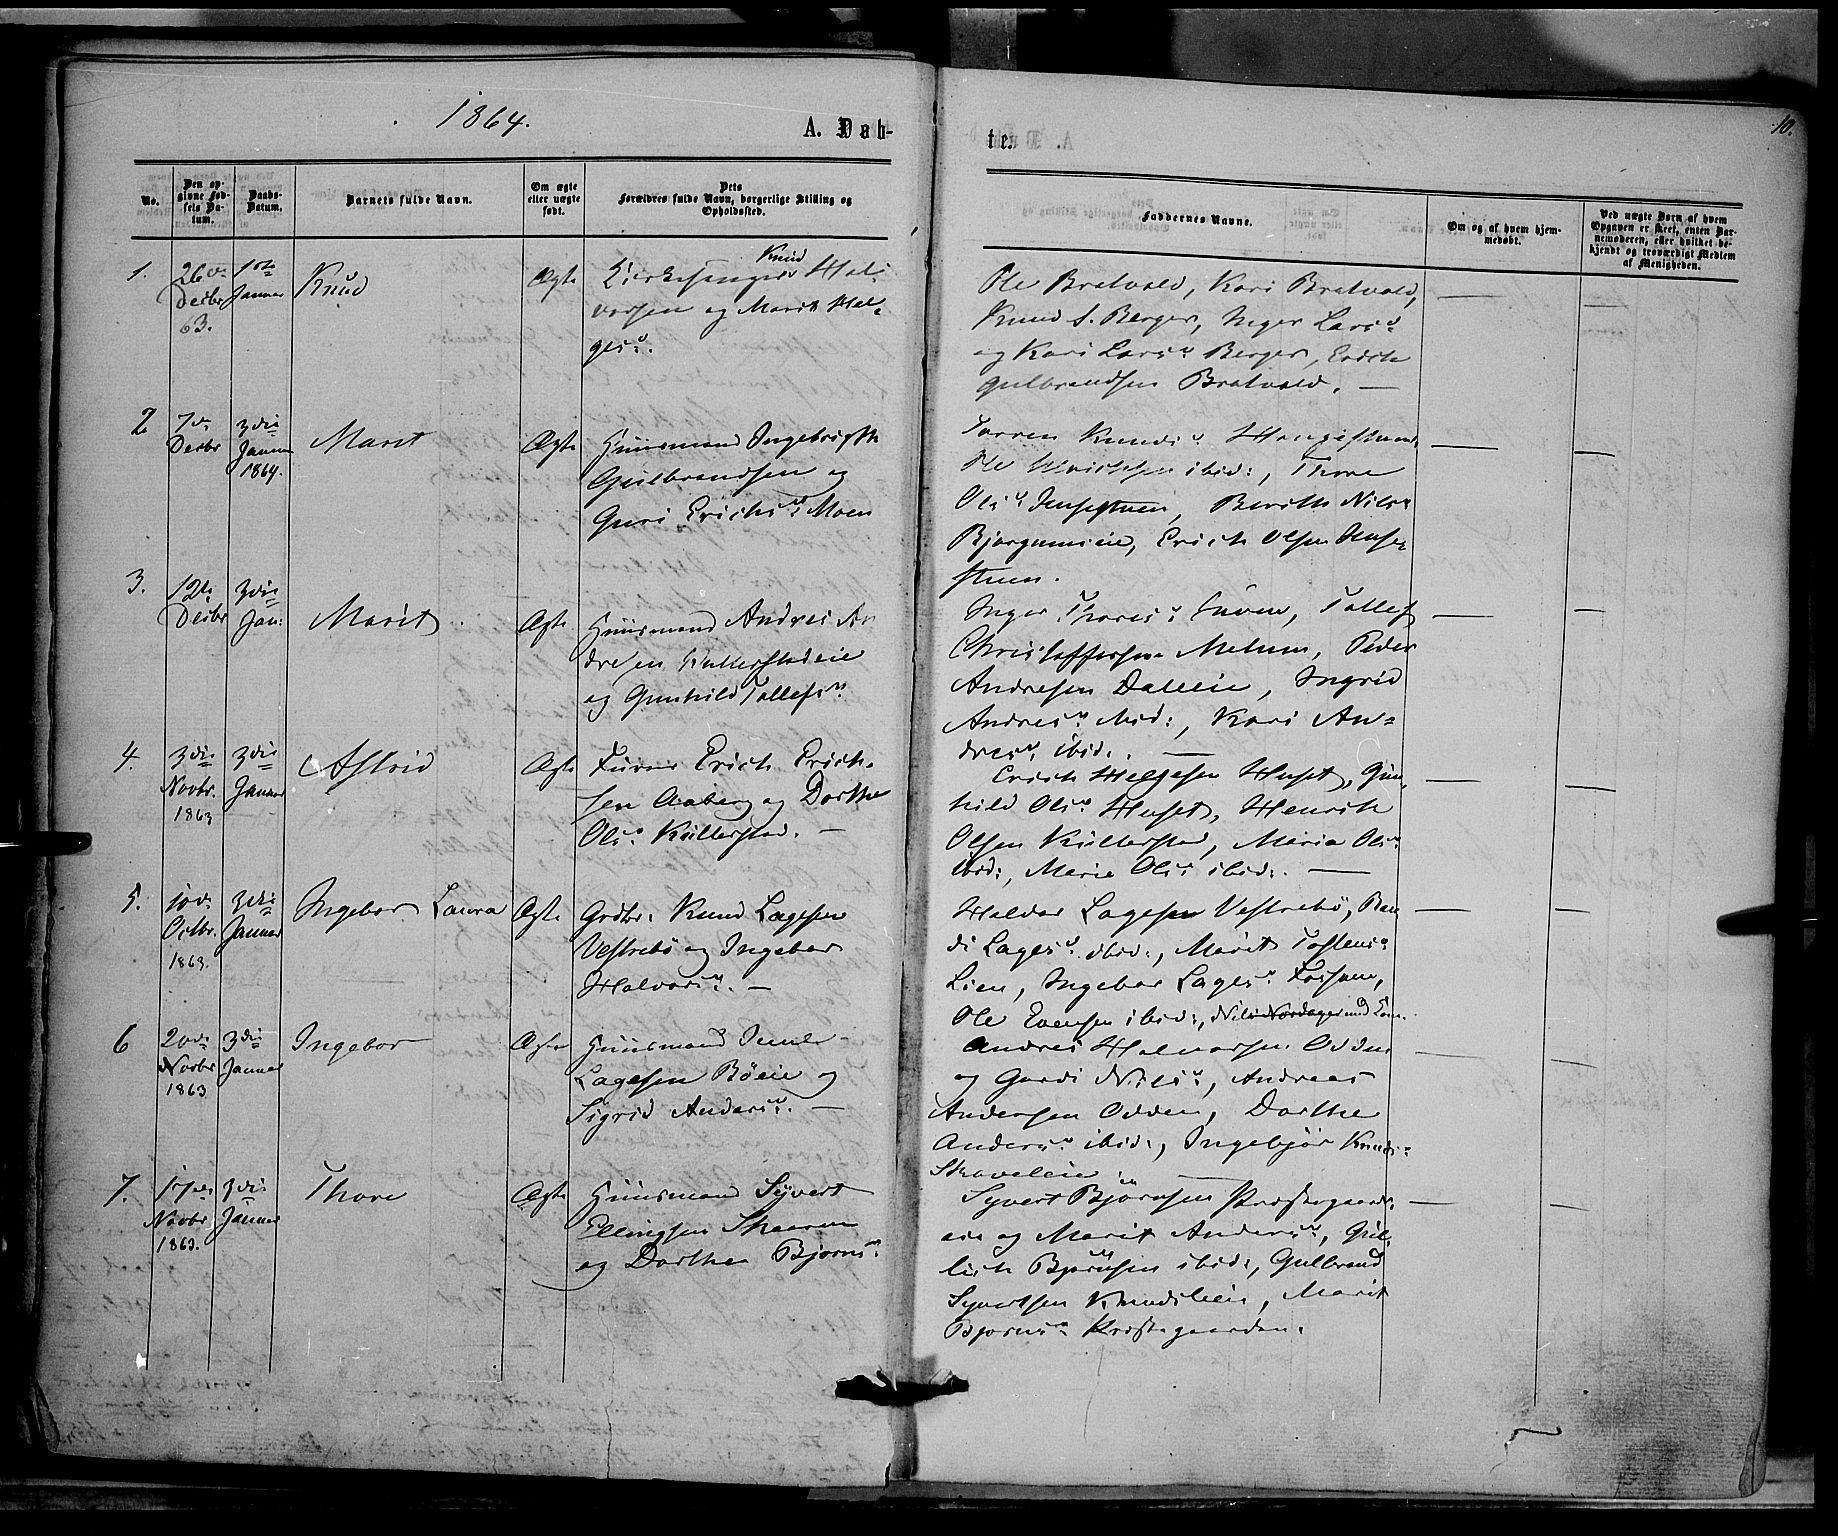 SAH, Nord-Aurdal prestekontor, Ministerialbok nr. 8, 1863-1875, s. 10